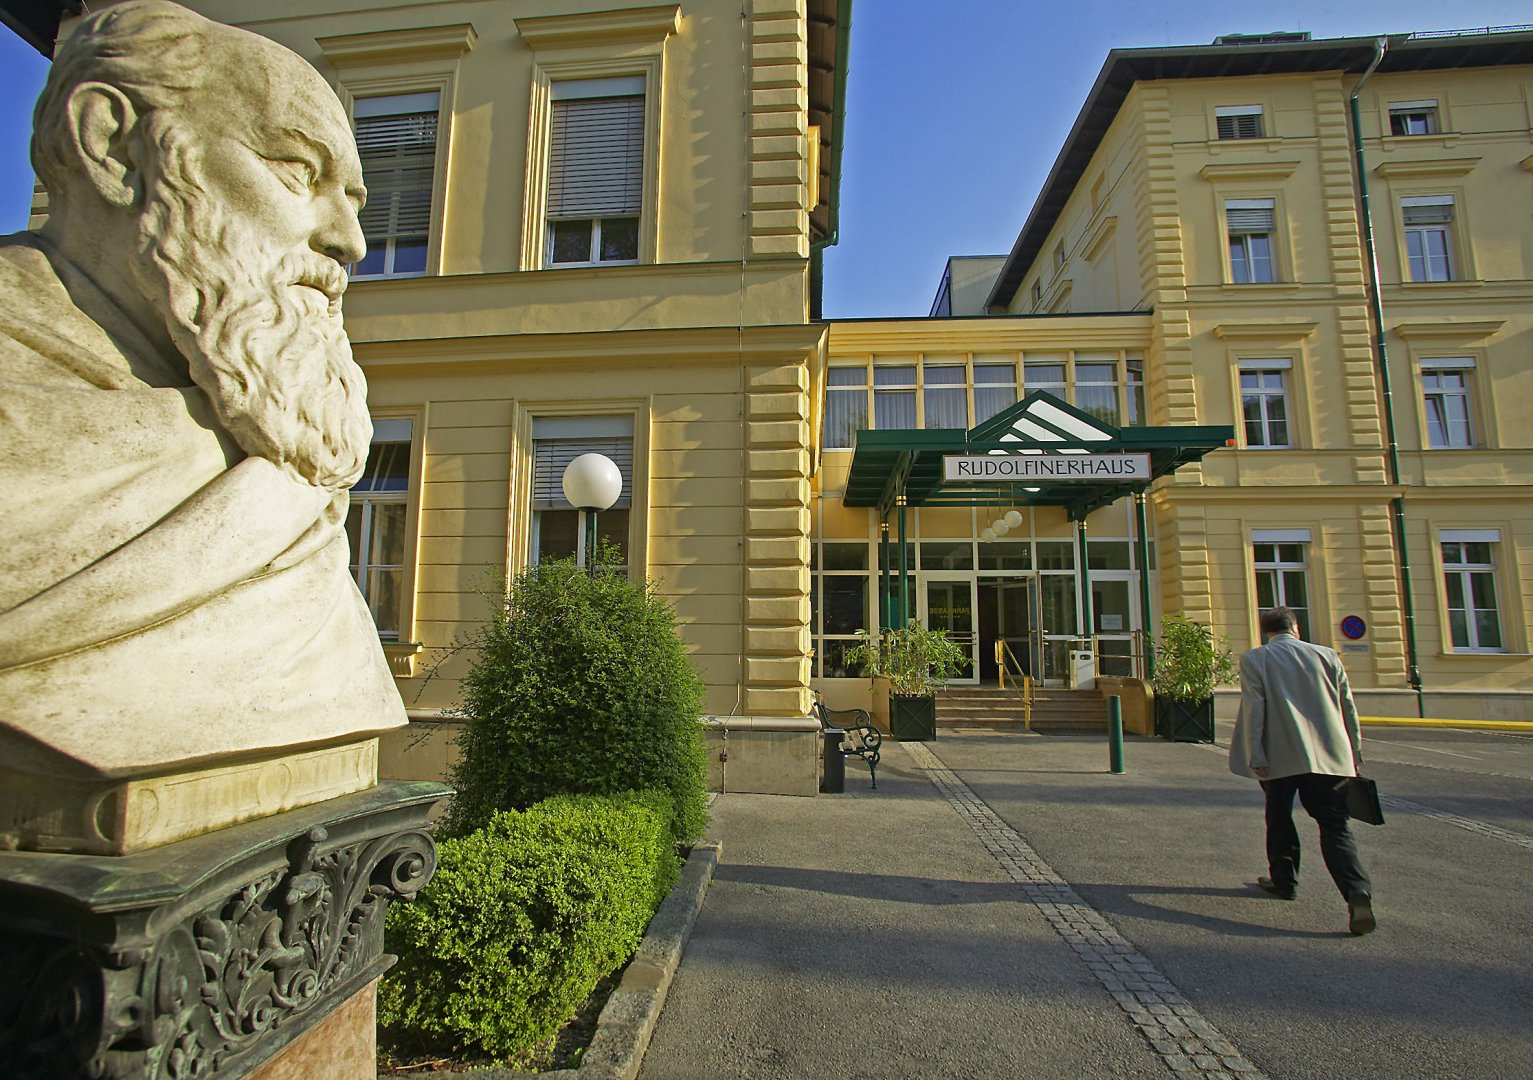 Клиника Рудольфинерхаус (Rudolfinerhaus)